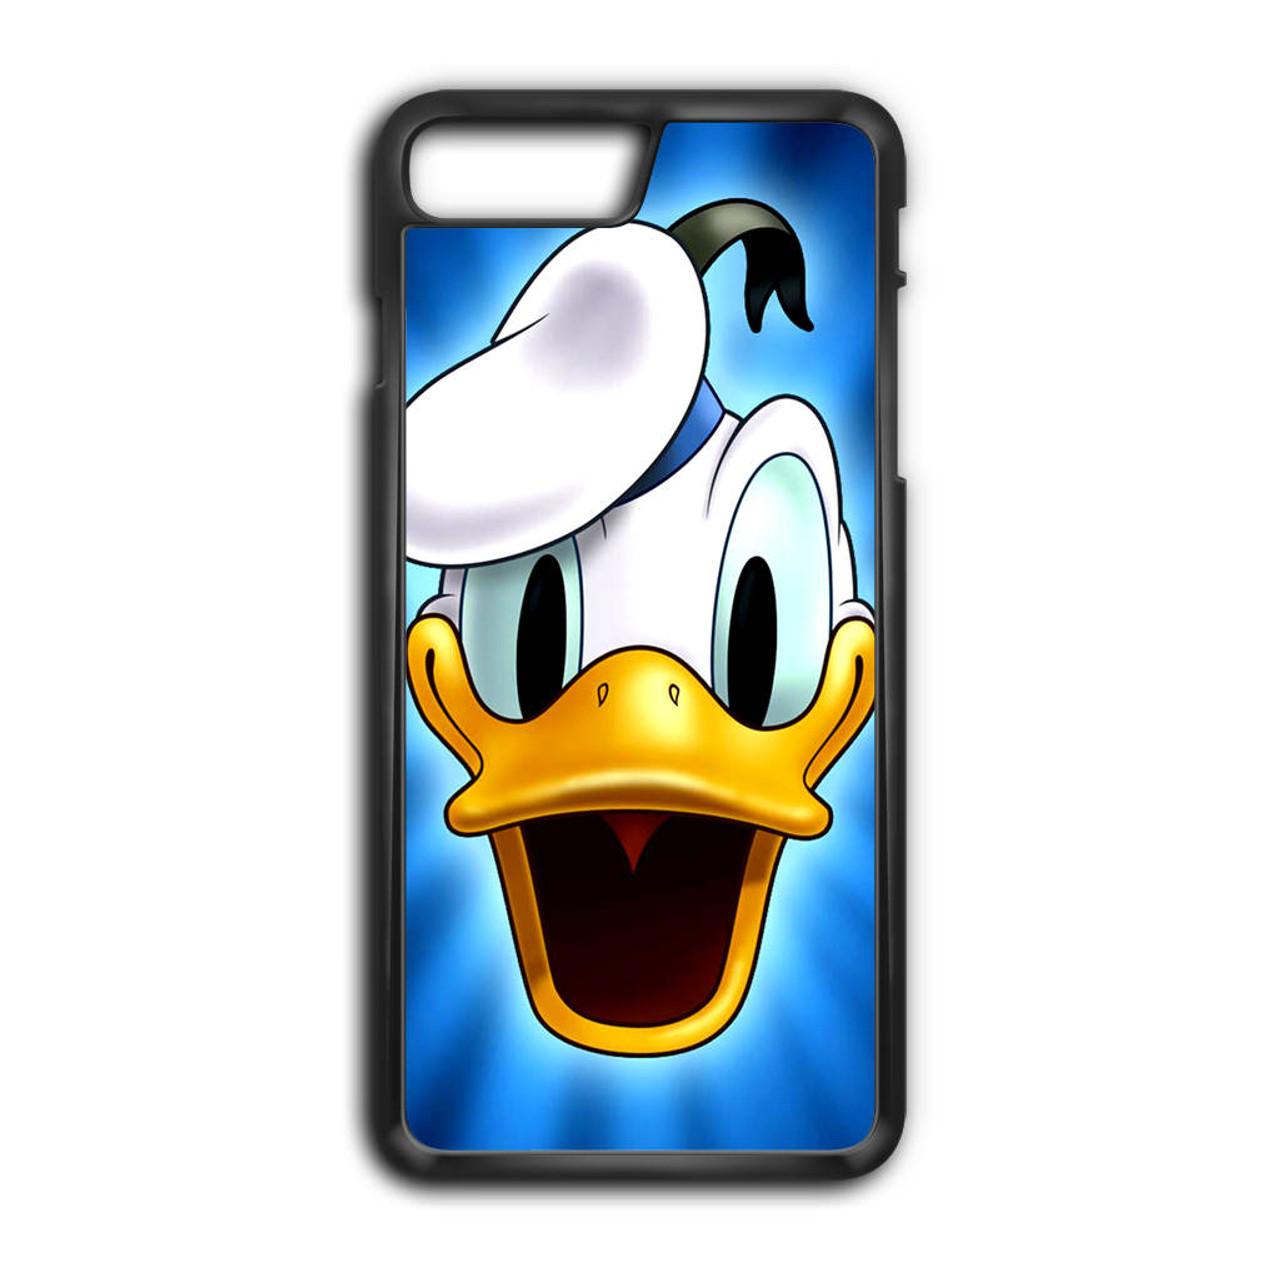 duck iphone 7 case